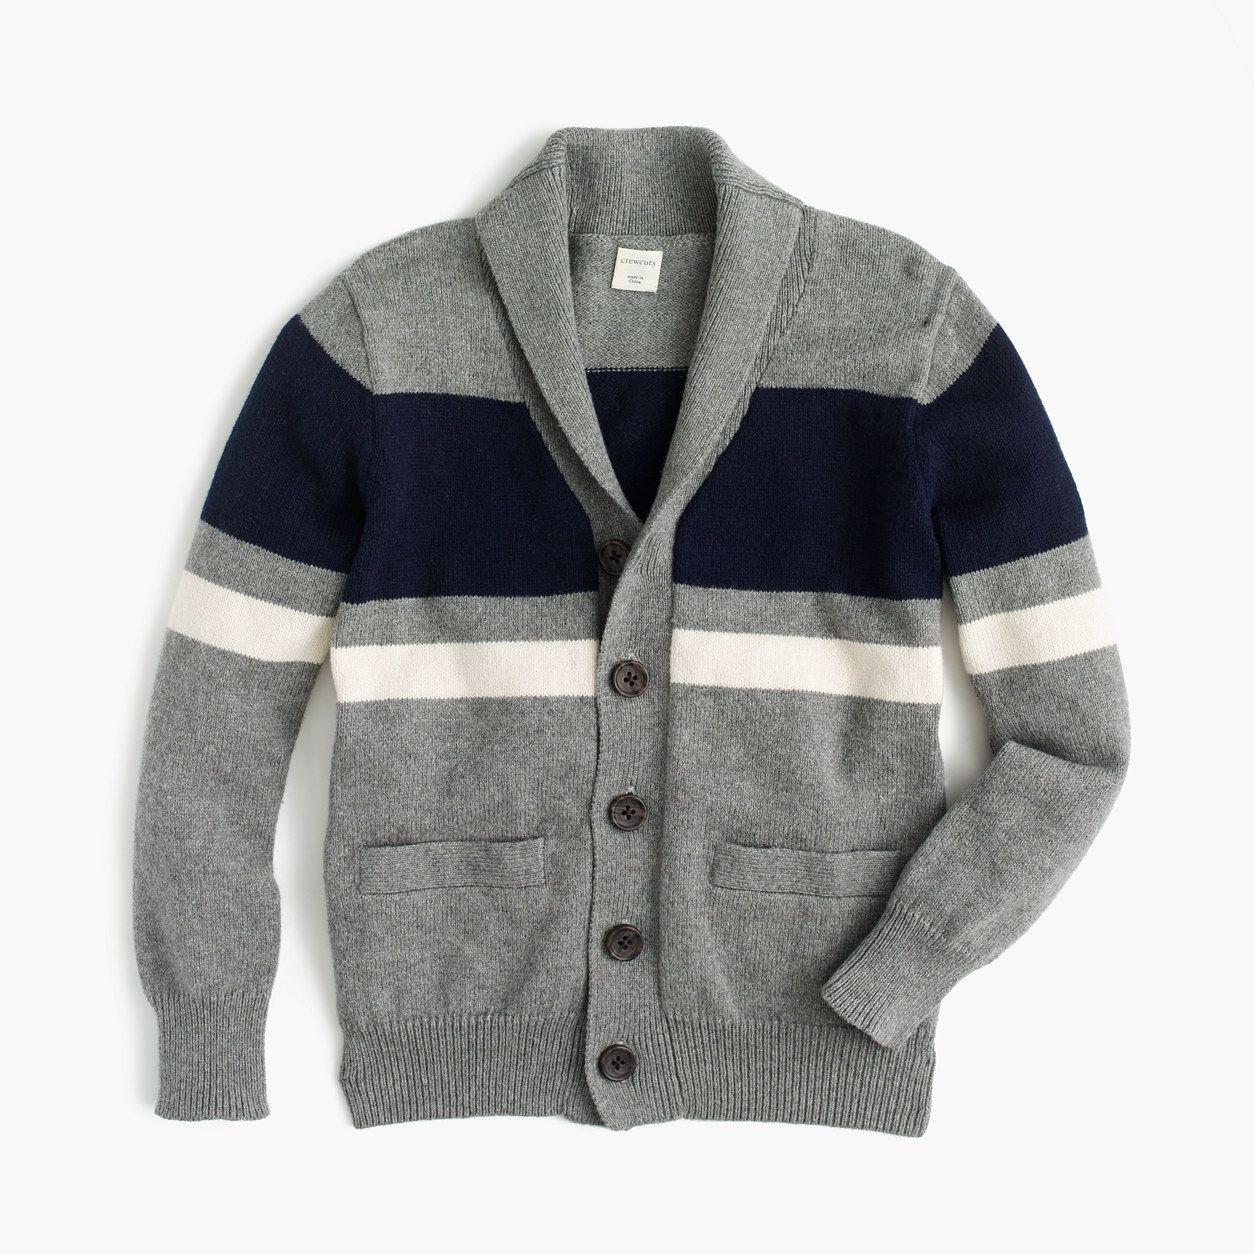 c55c6ddea crewcuts Boys Shawl-Collar Striped Cardigan (Size 12 Kid) | Products ...